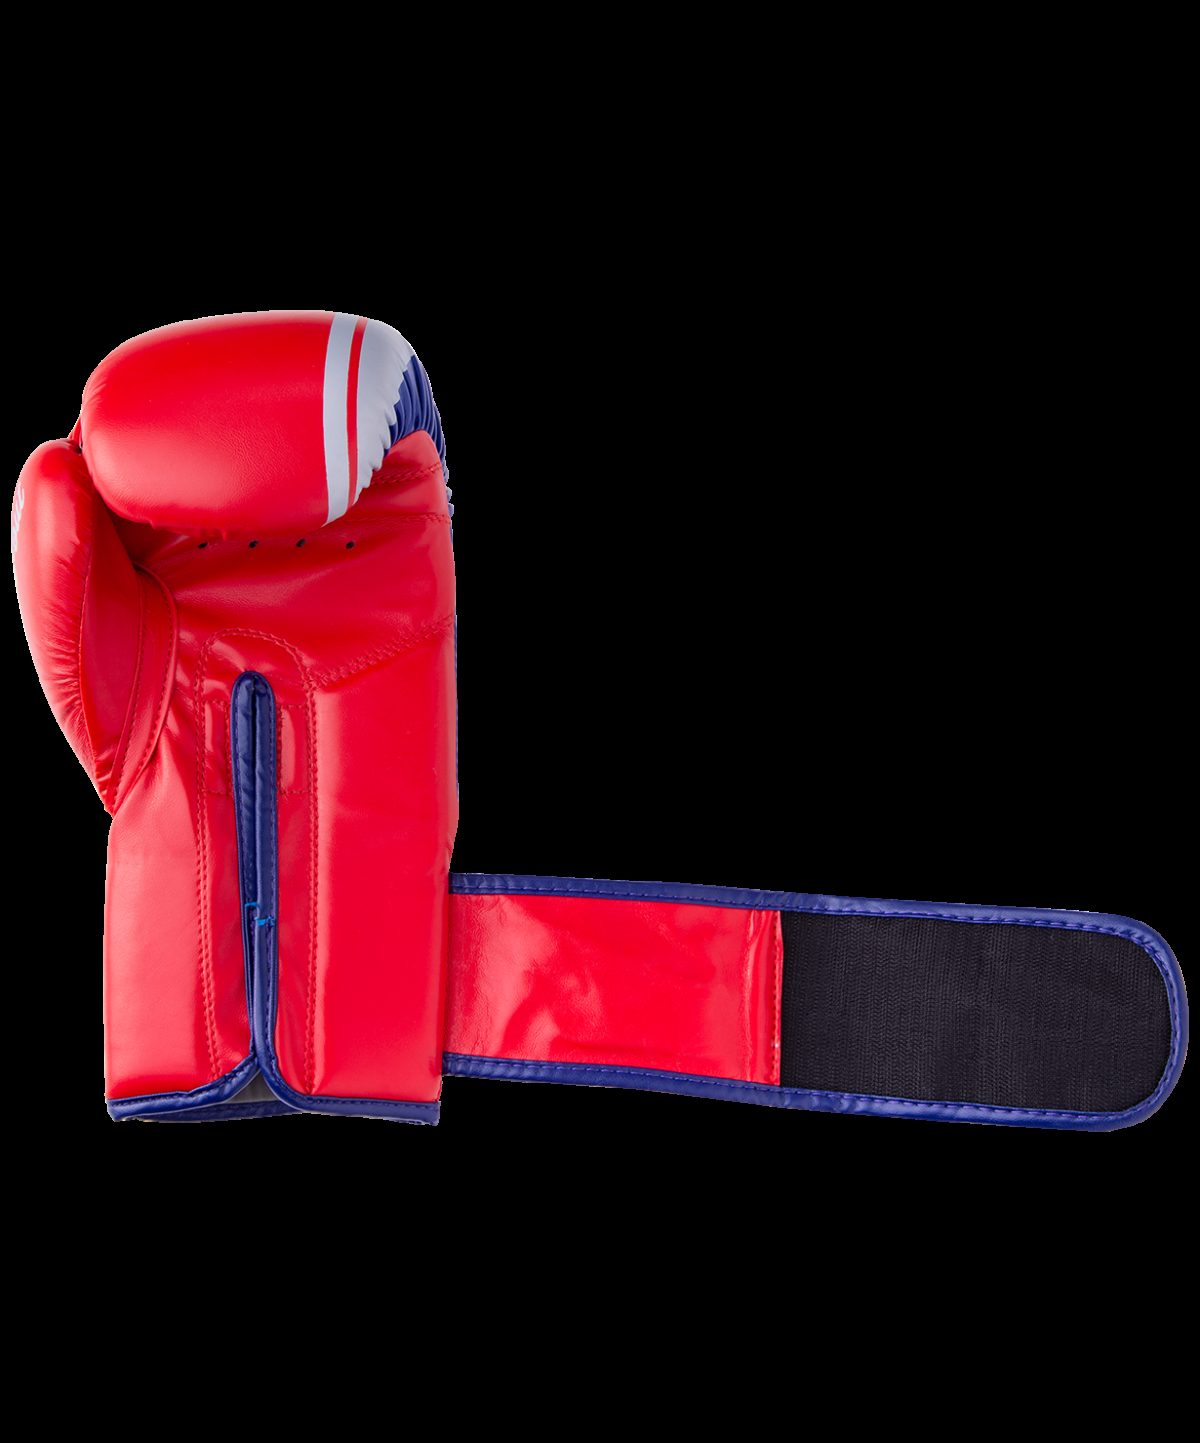 GREEN HILL Перчатки боксерские 10 oz Knockout  BGK-2266: красный - 5